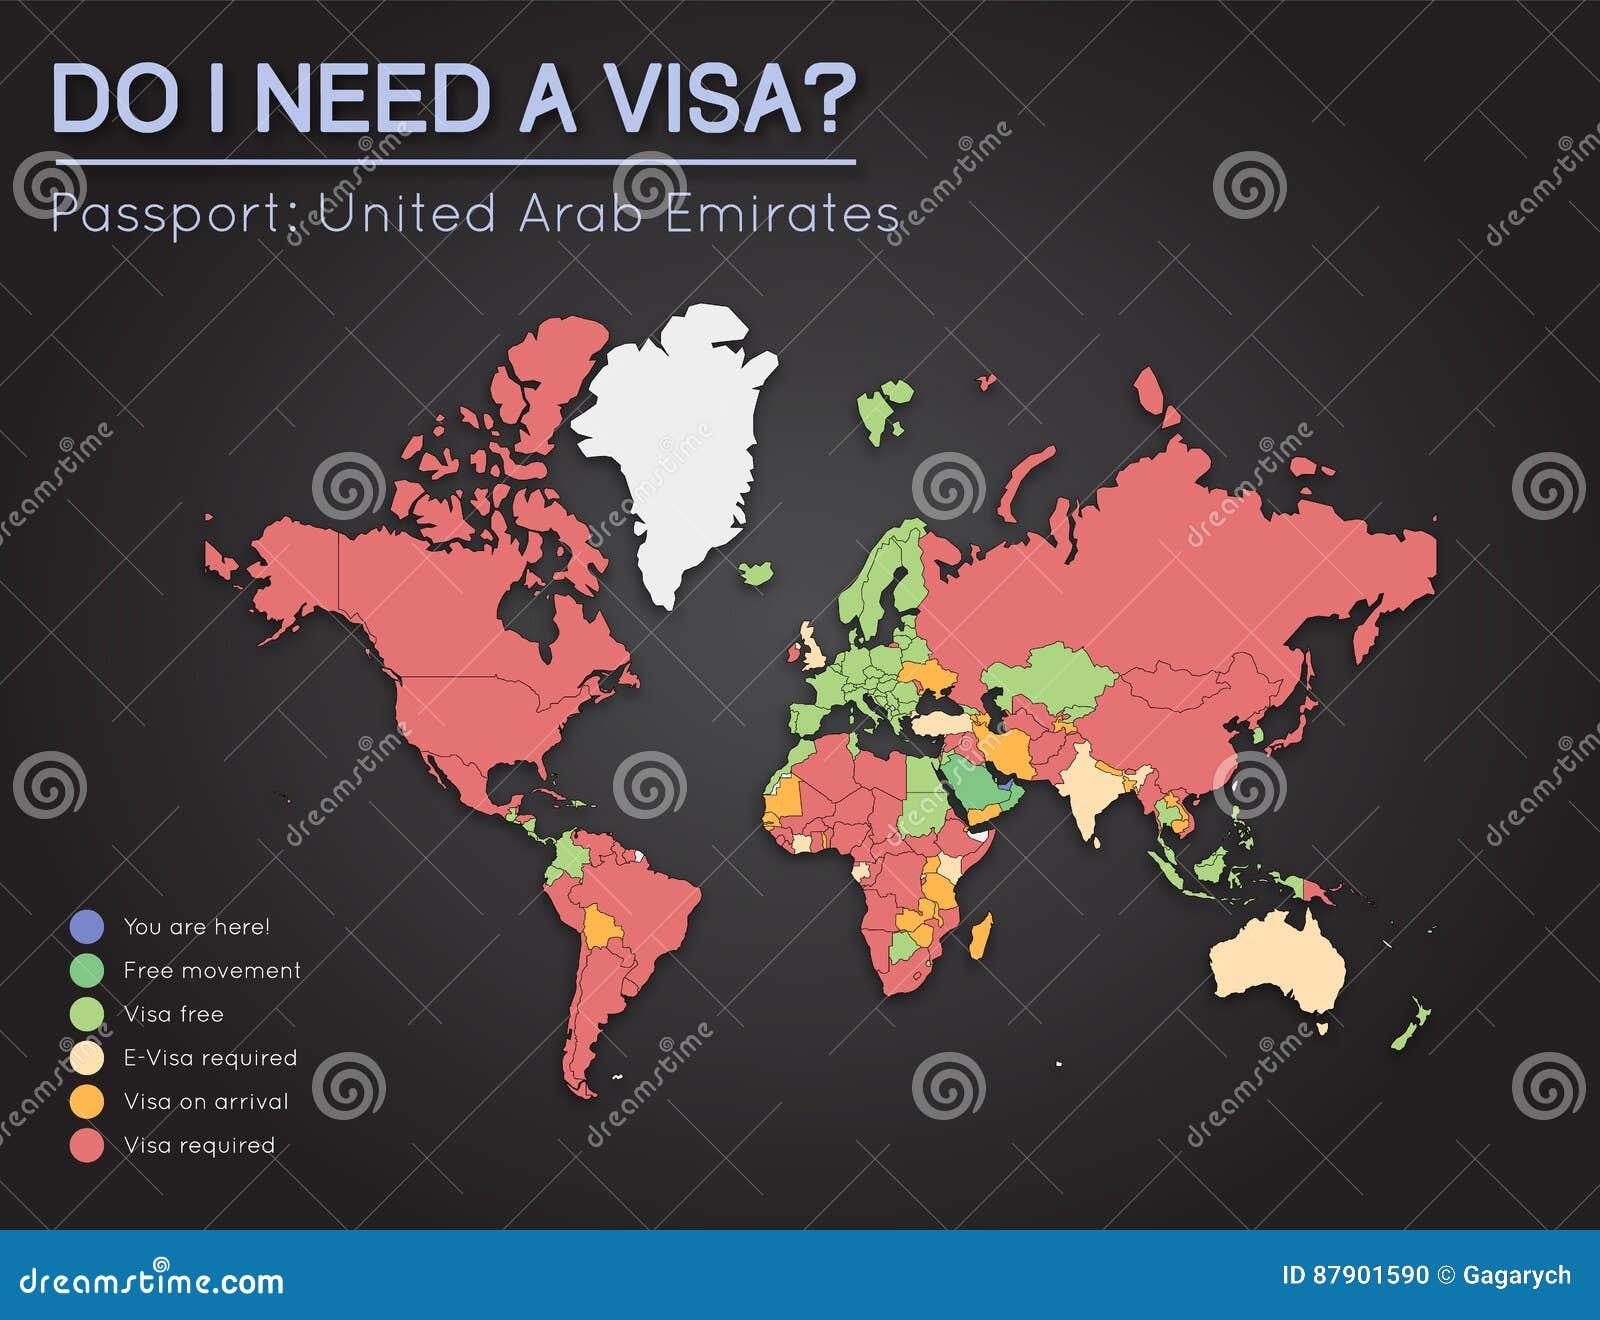 Visas Information For United Arab Emirates. Stock Vector ...